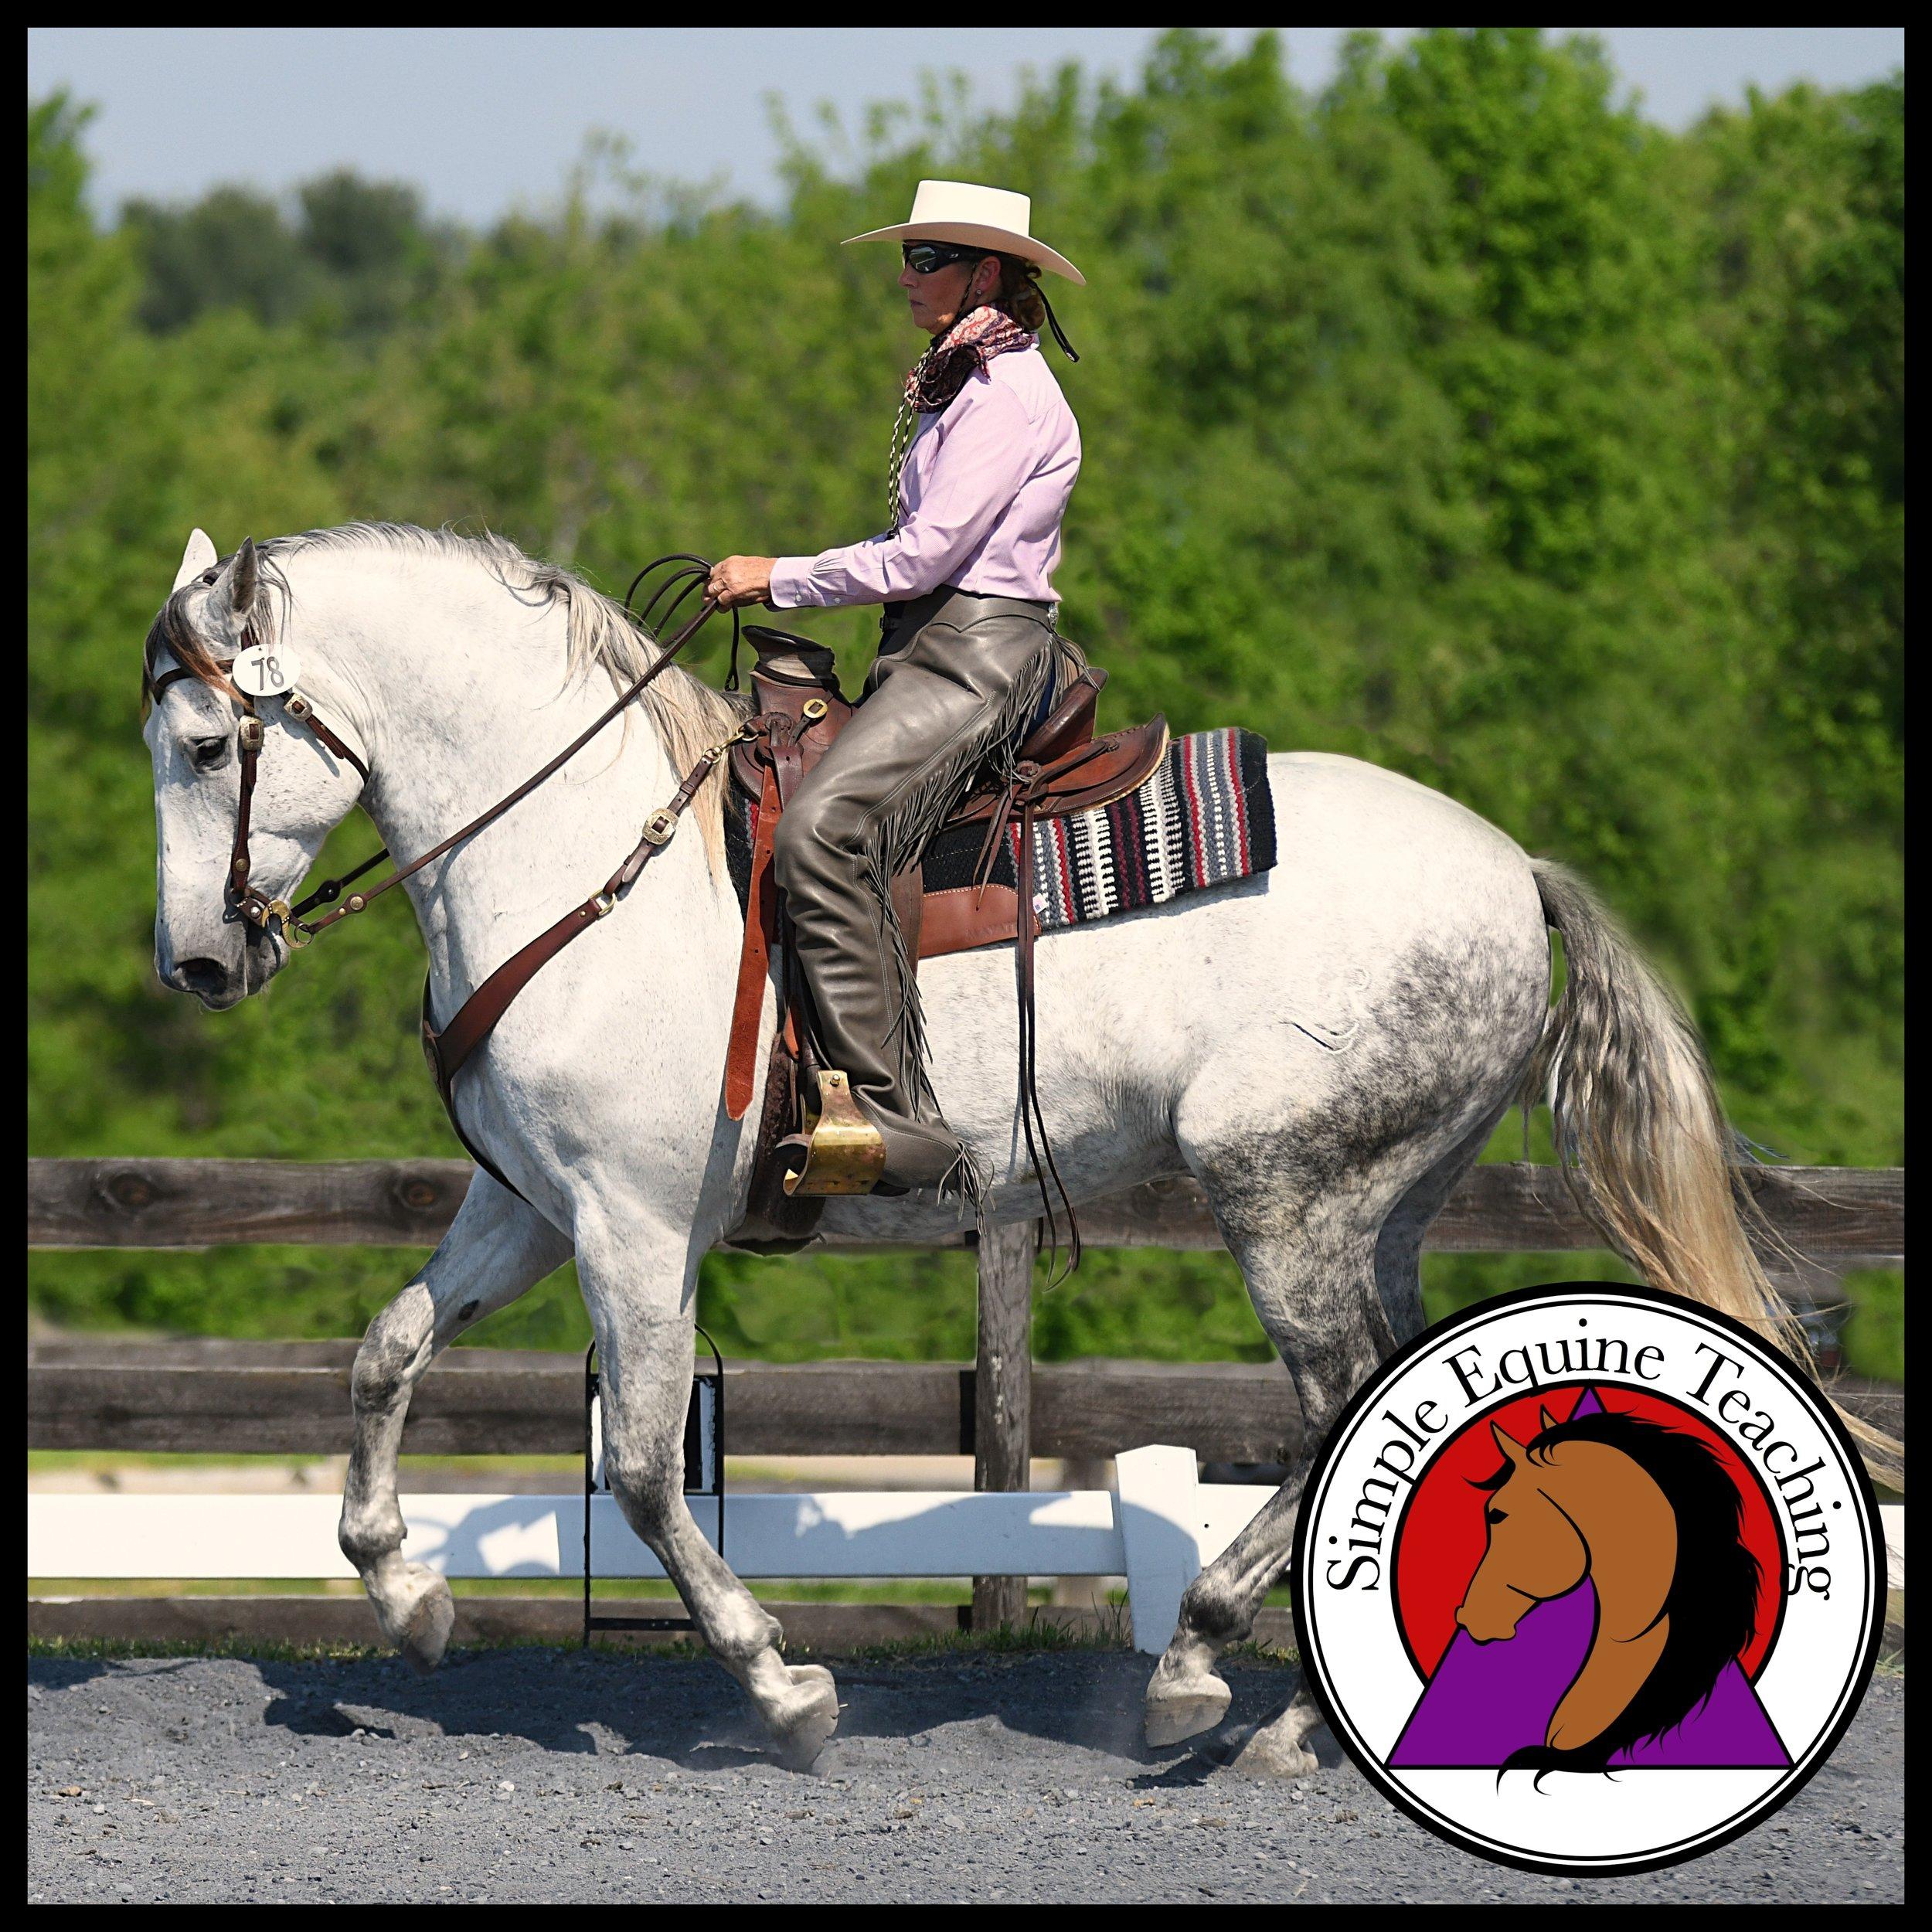 Dee Janelle - Simple Equine Teaching  Photo credit: Jaime McArdle